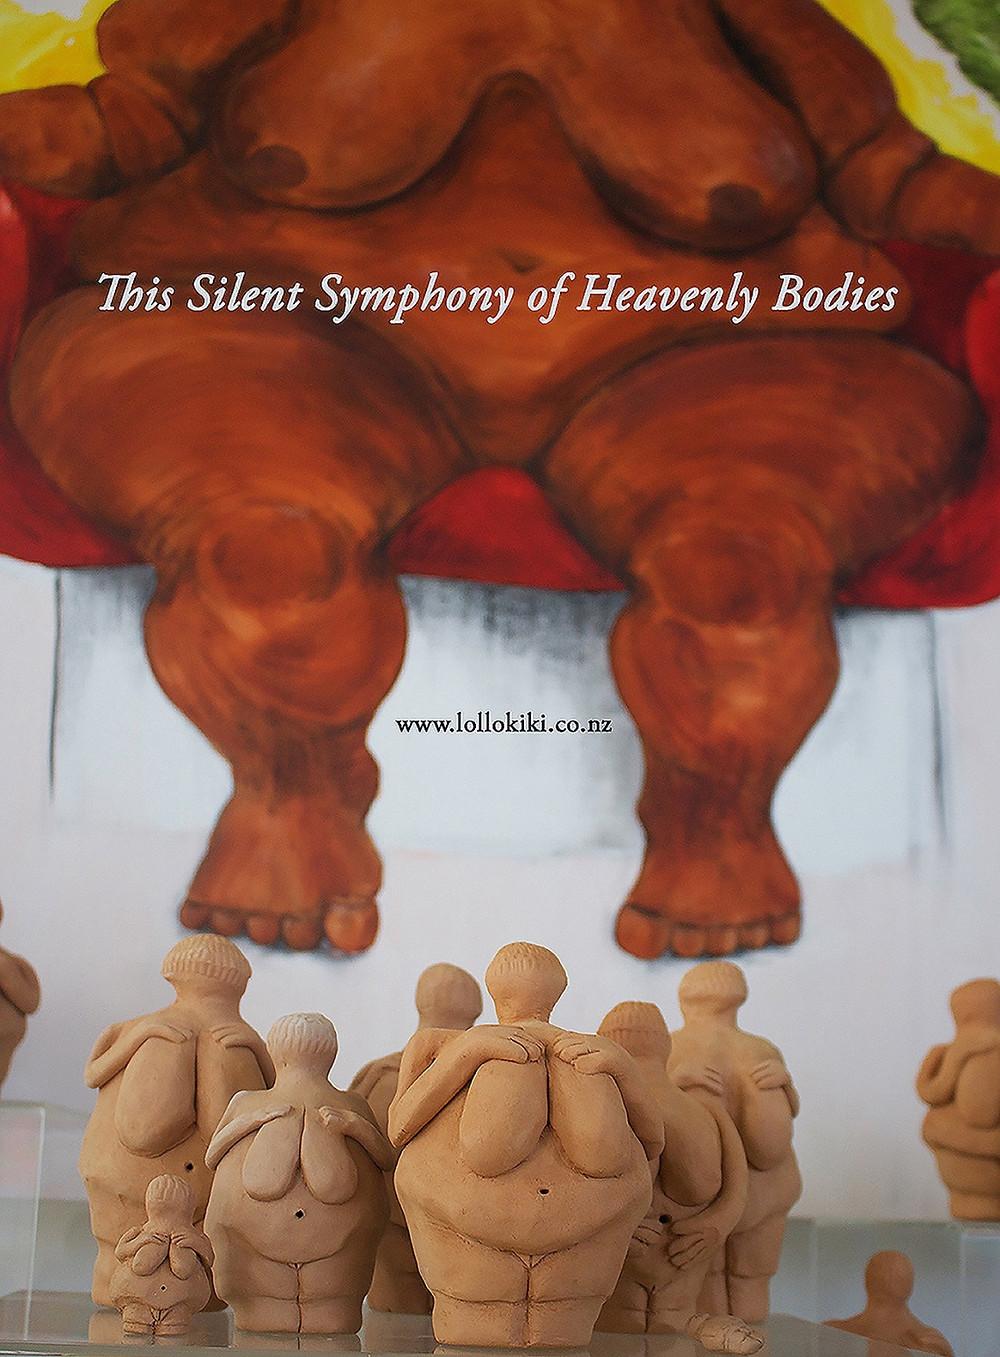 venus de willendorf sculptures infront of large canvas